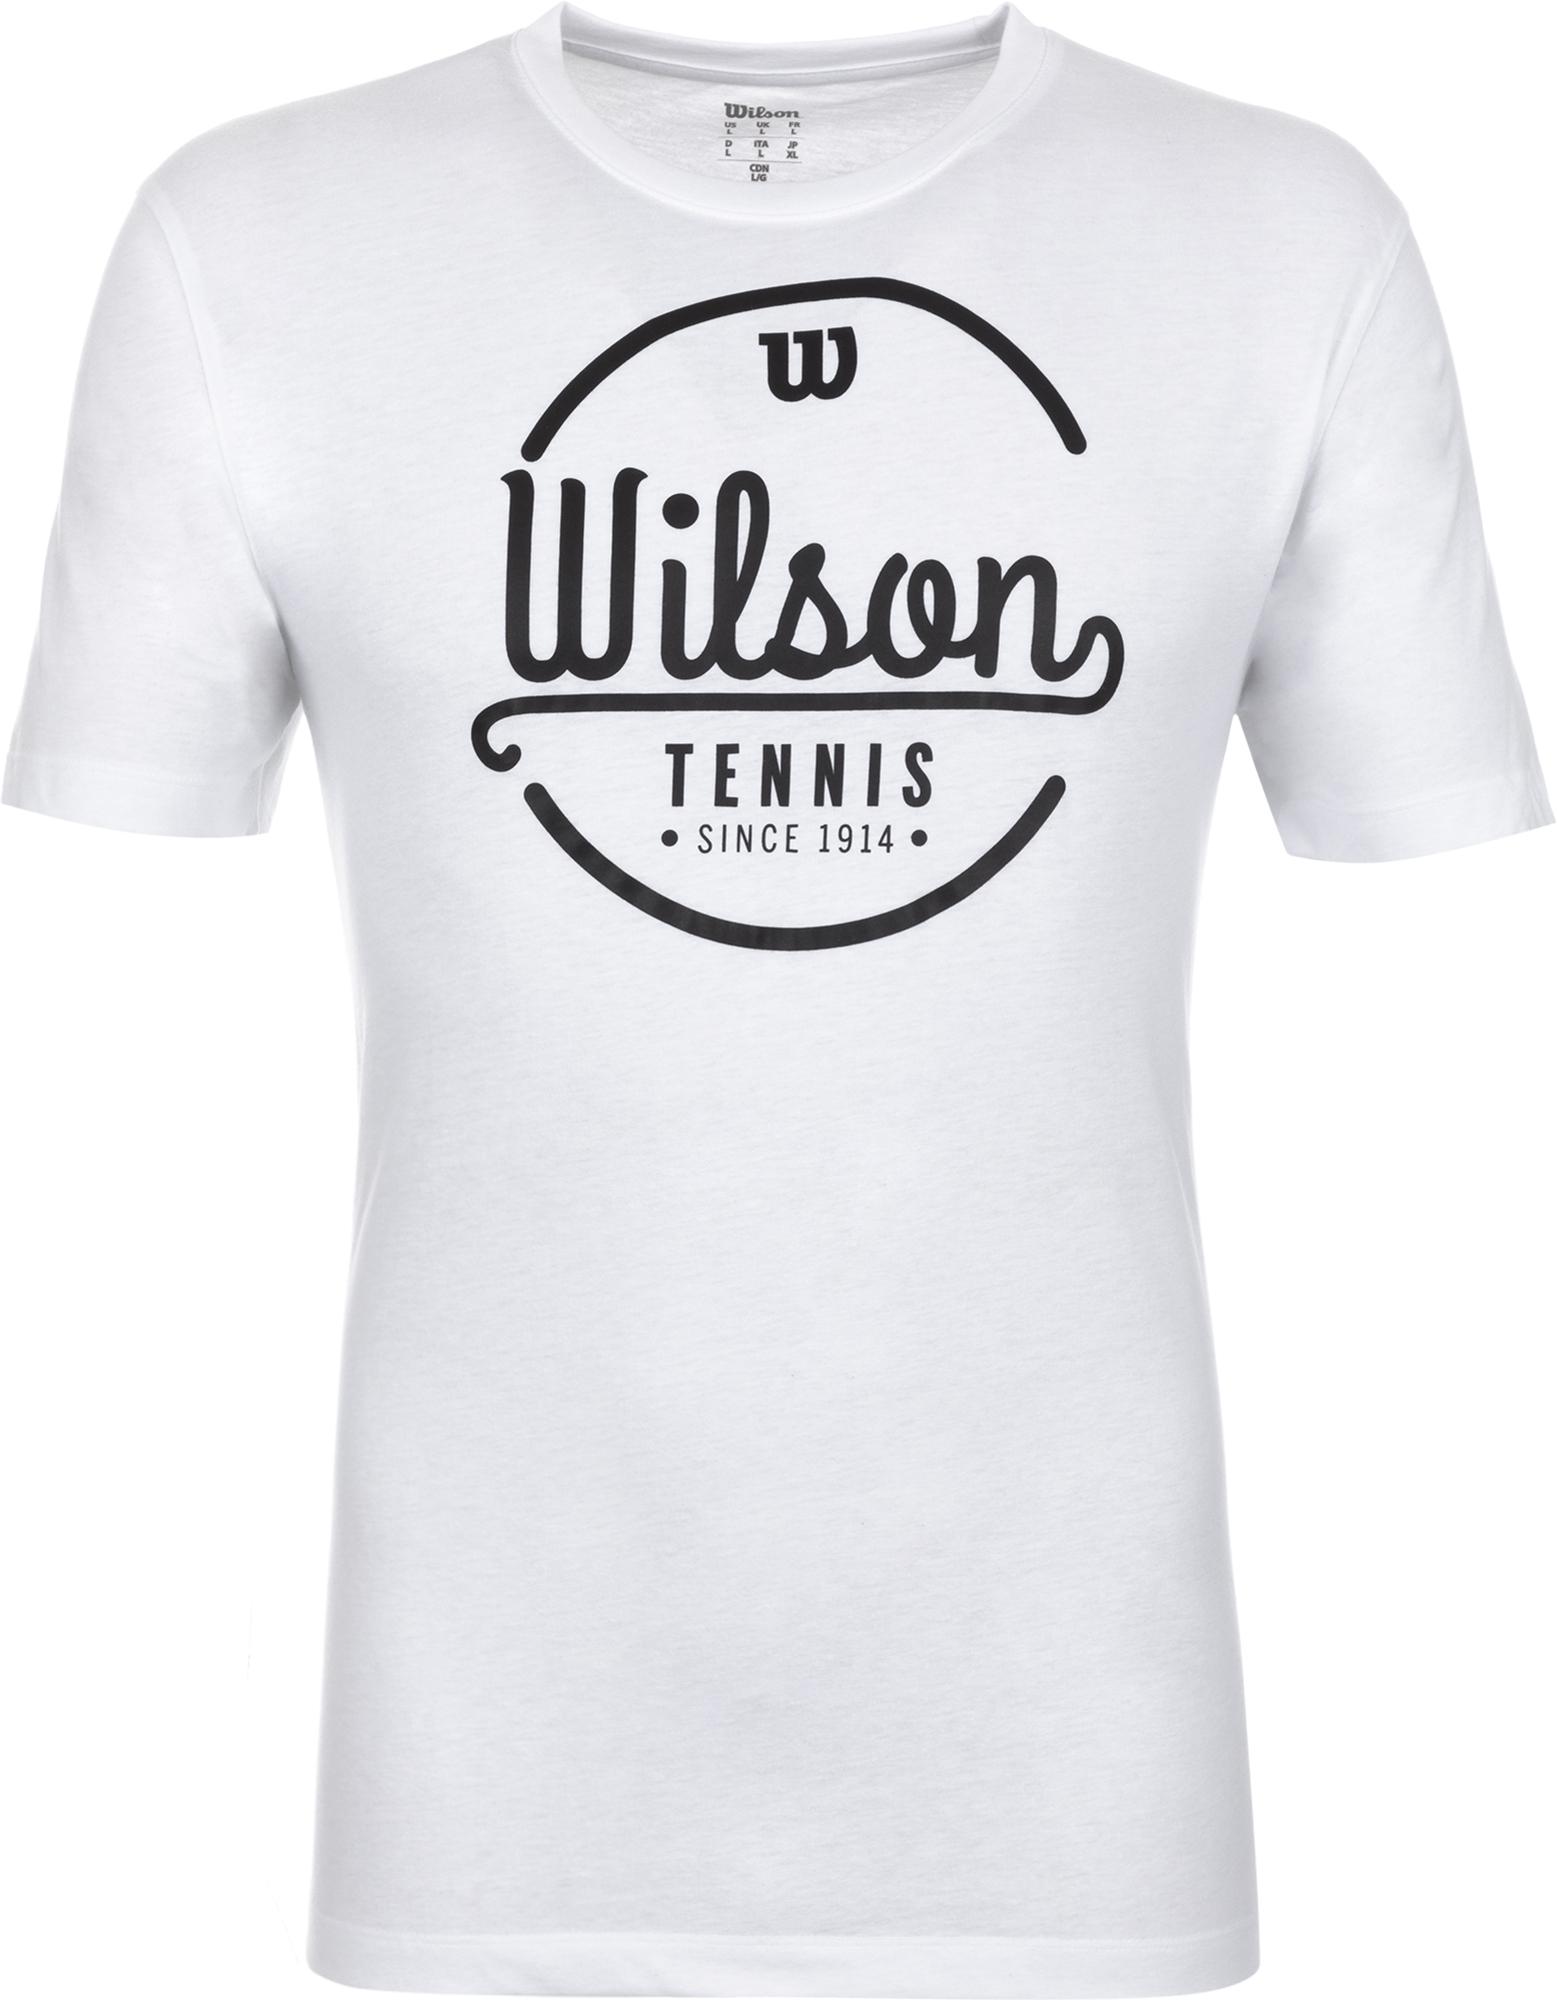 купить Wilson Футболка мужская Wilson Lineage Tech Tee, размер 54-56 по цене 1999 рублей